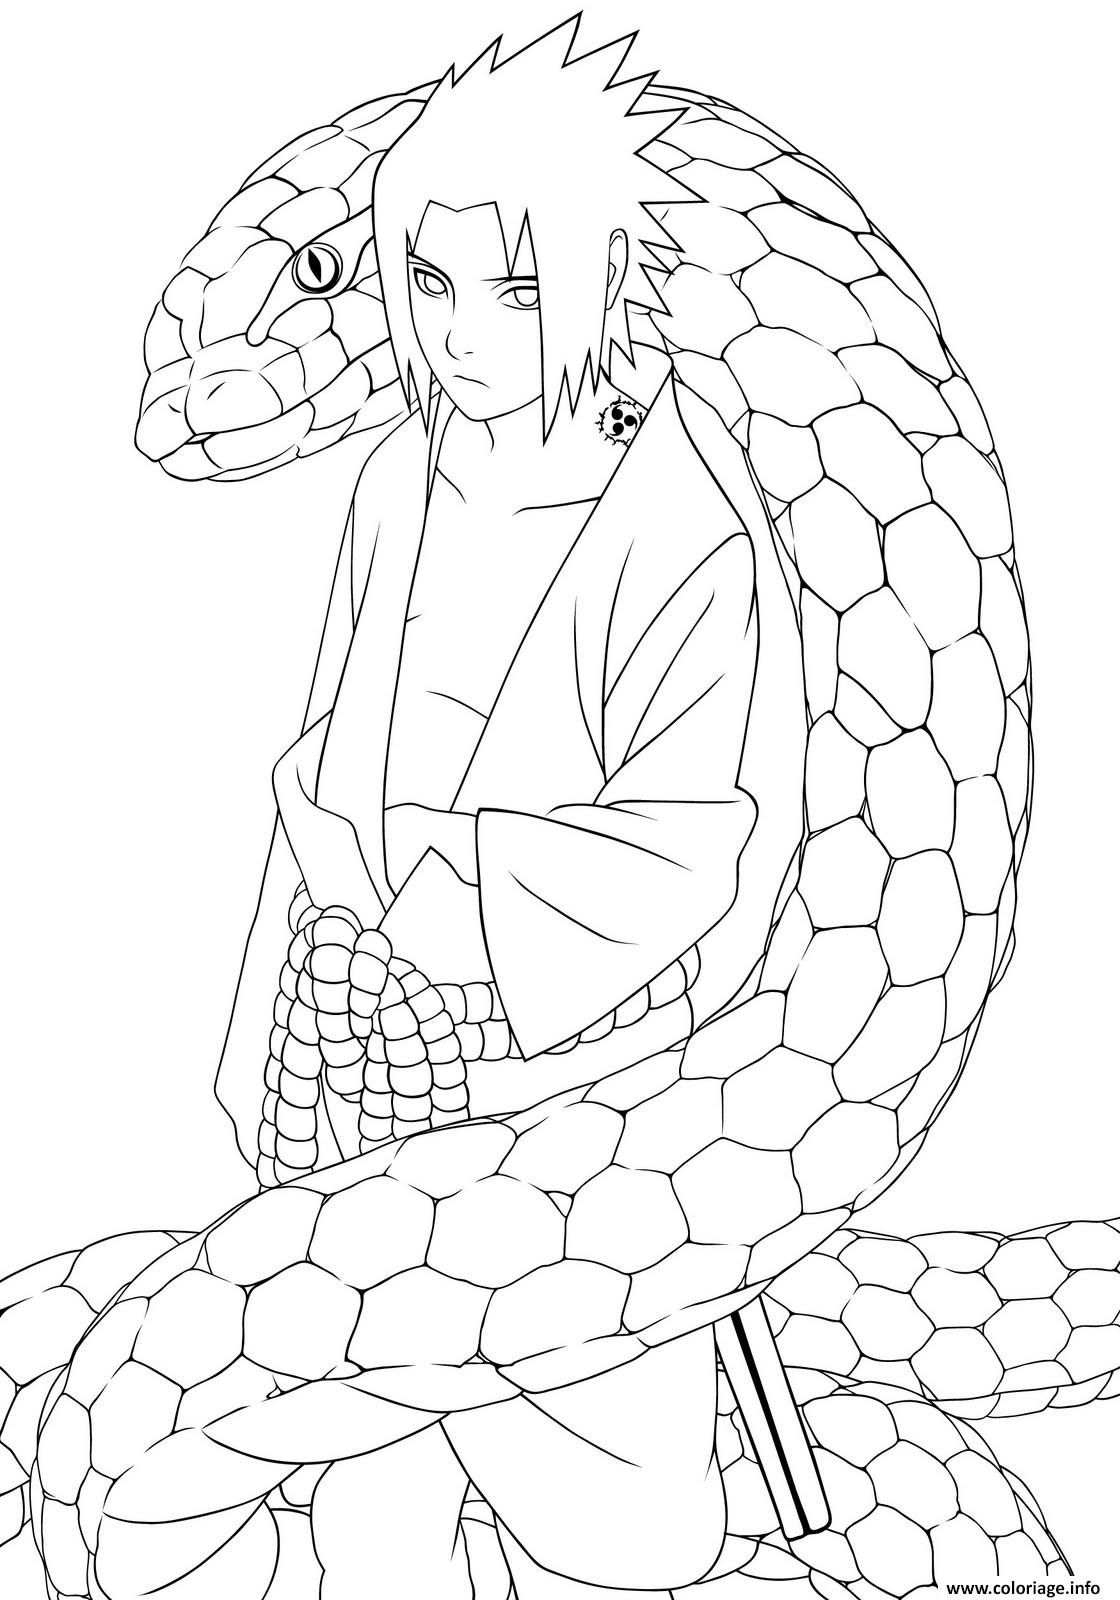 Dessin manga naruto 2 Coloriage Gratuit à Imprimer